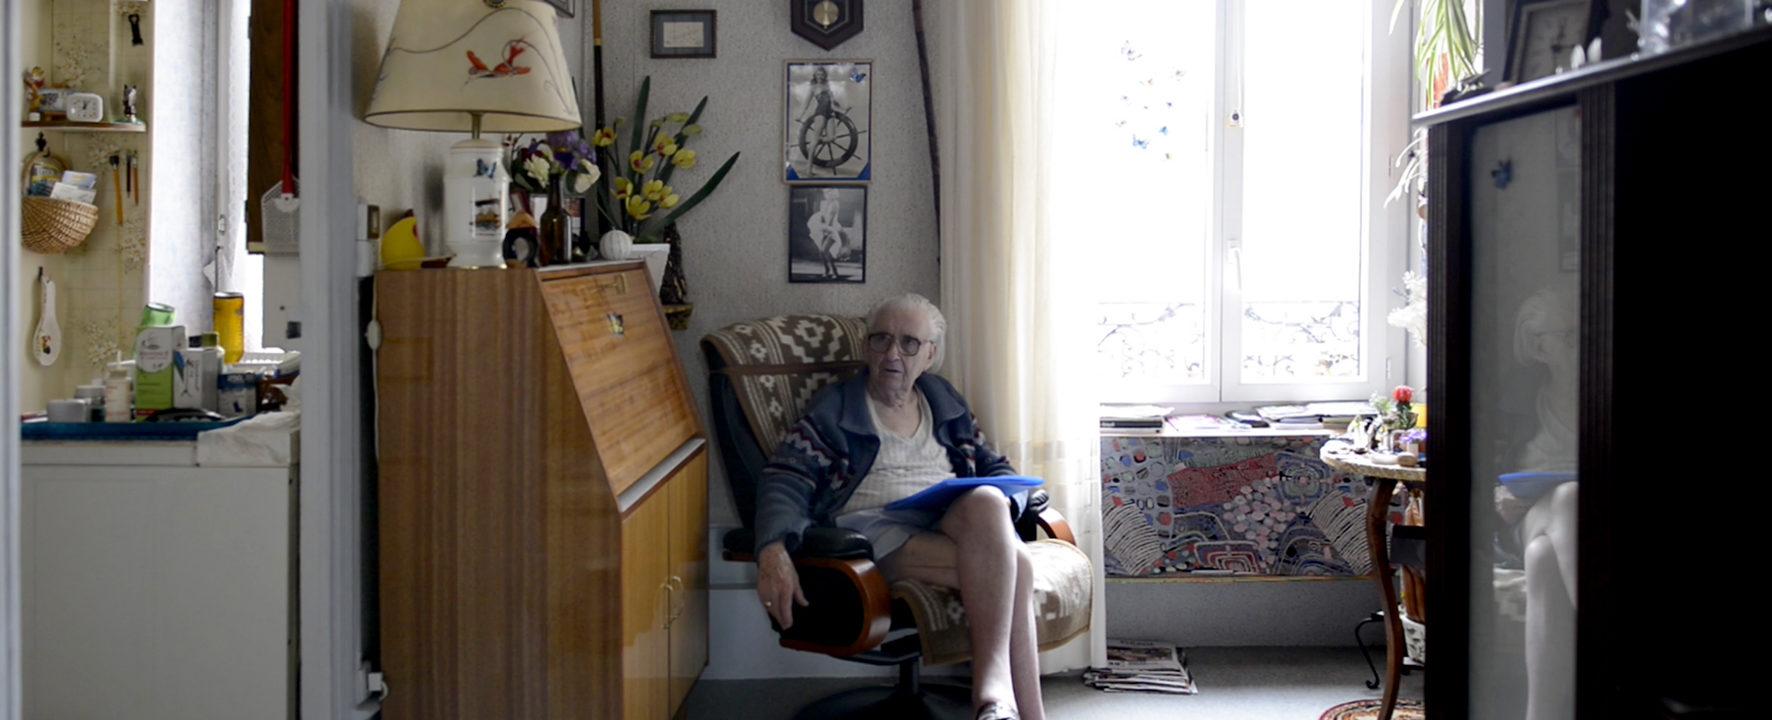 Amelie Berrodier - Formidable - 2015